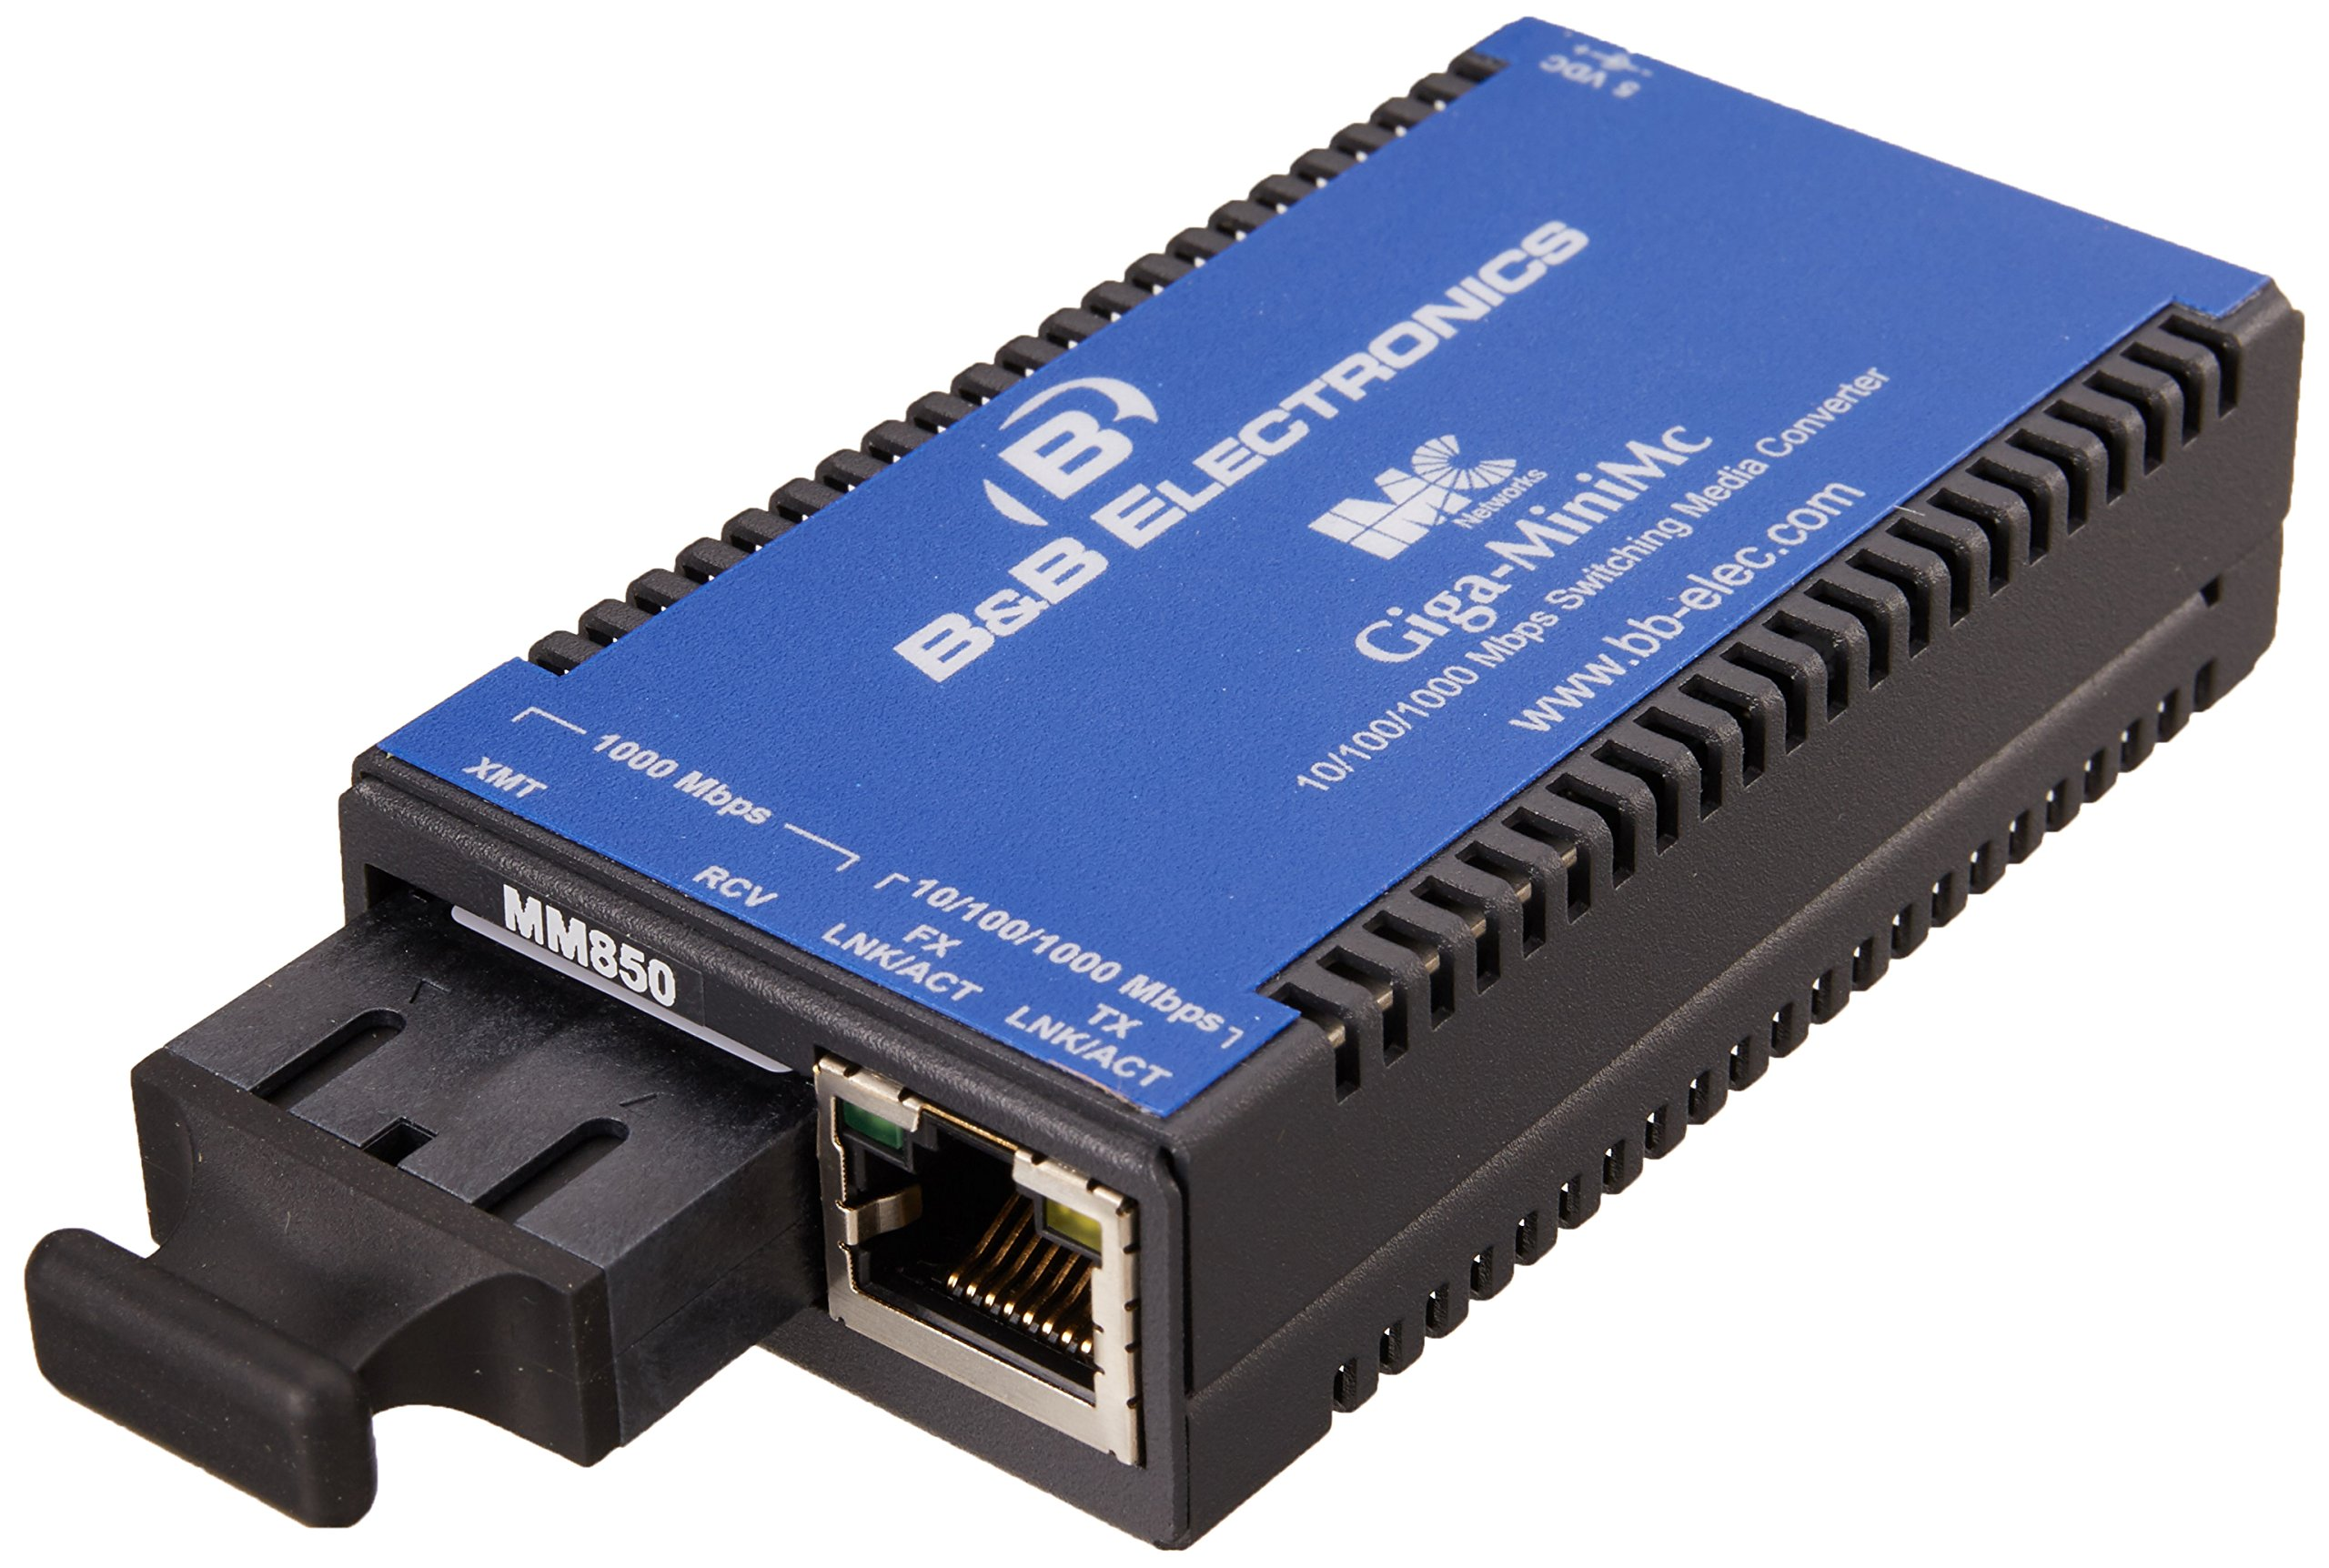 Rohs Giga-minimc TX/SXMM850-SC 300 M - 7.5 Db by IMC Networks